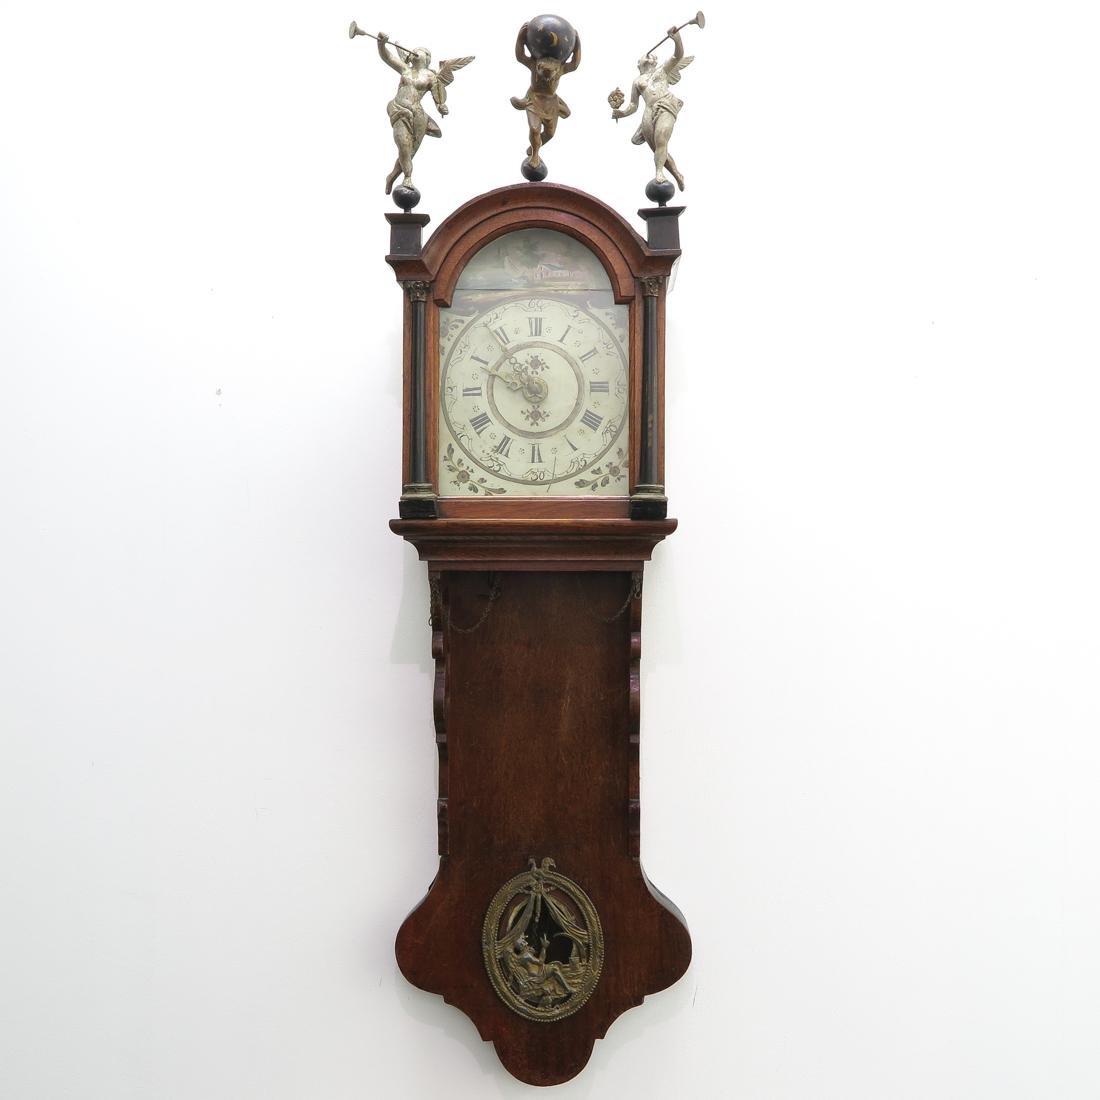 Dutch Wall Clock or Friese Staartklok